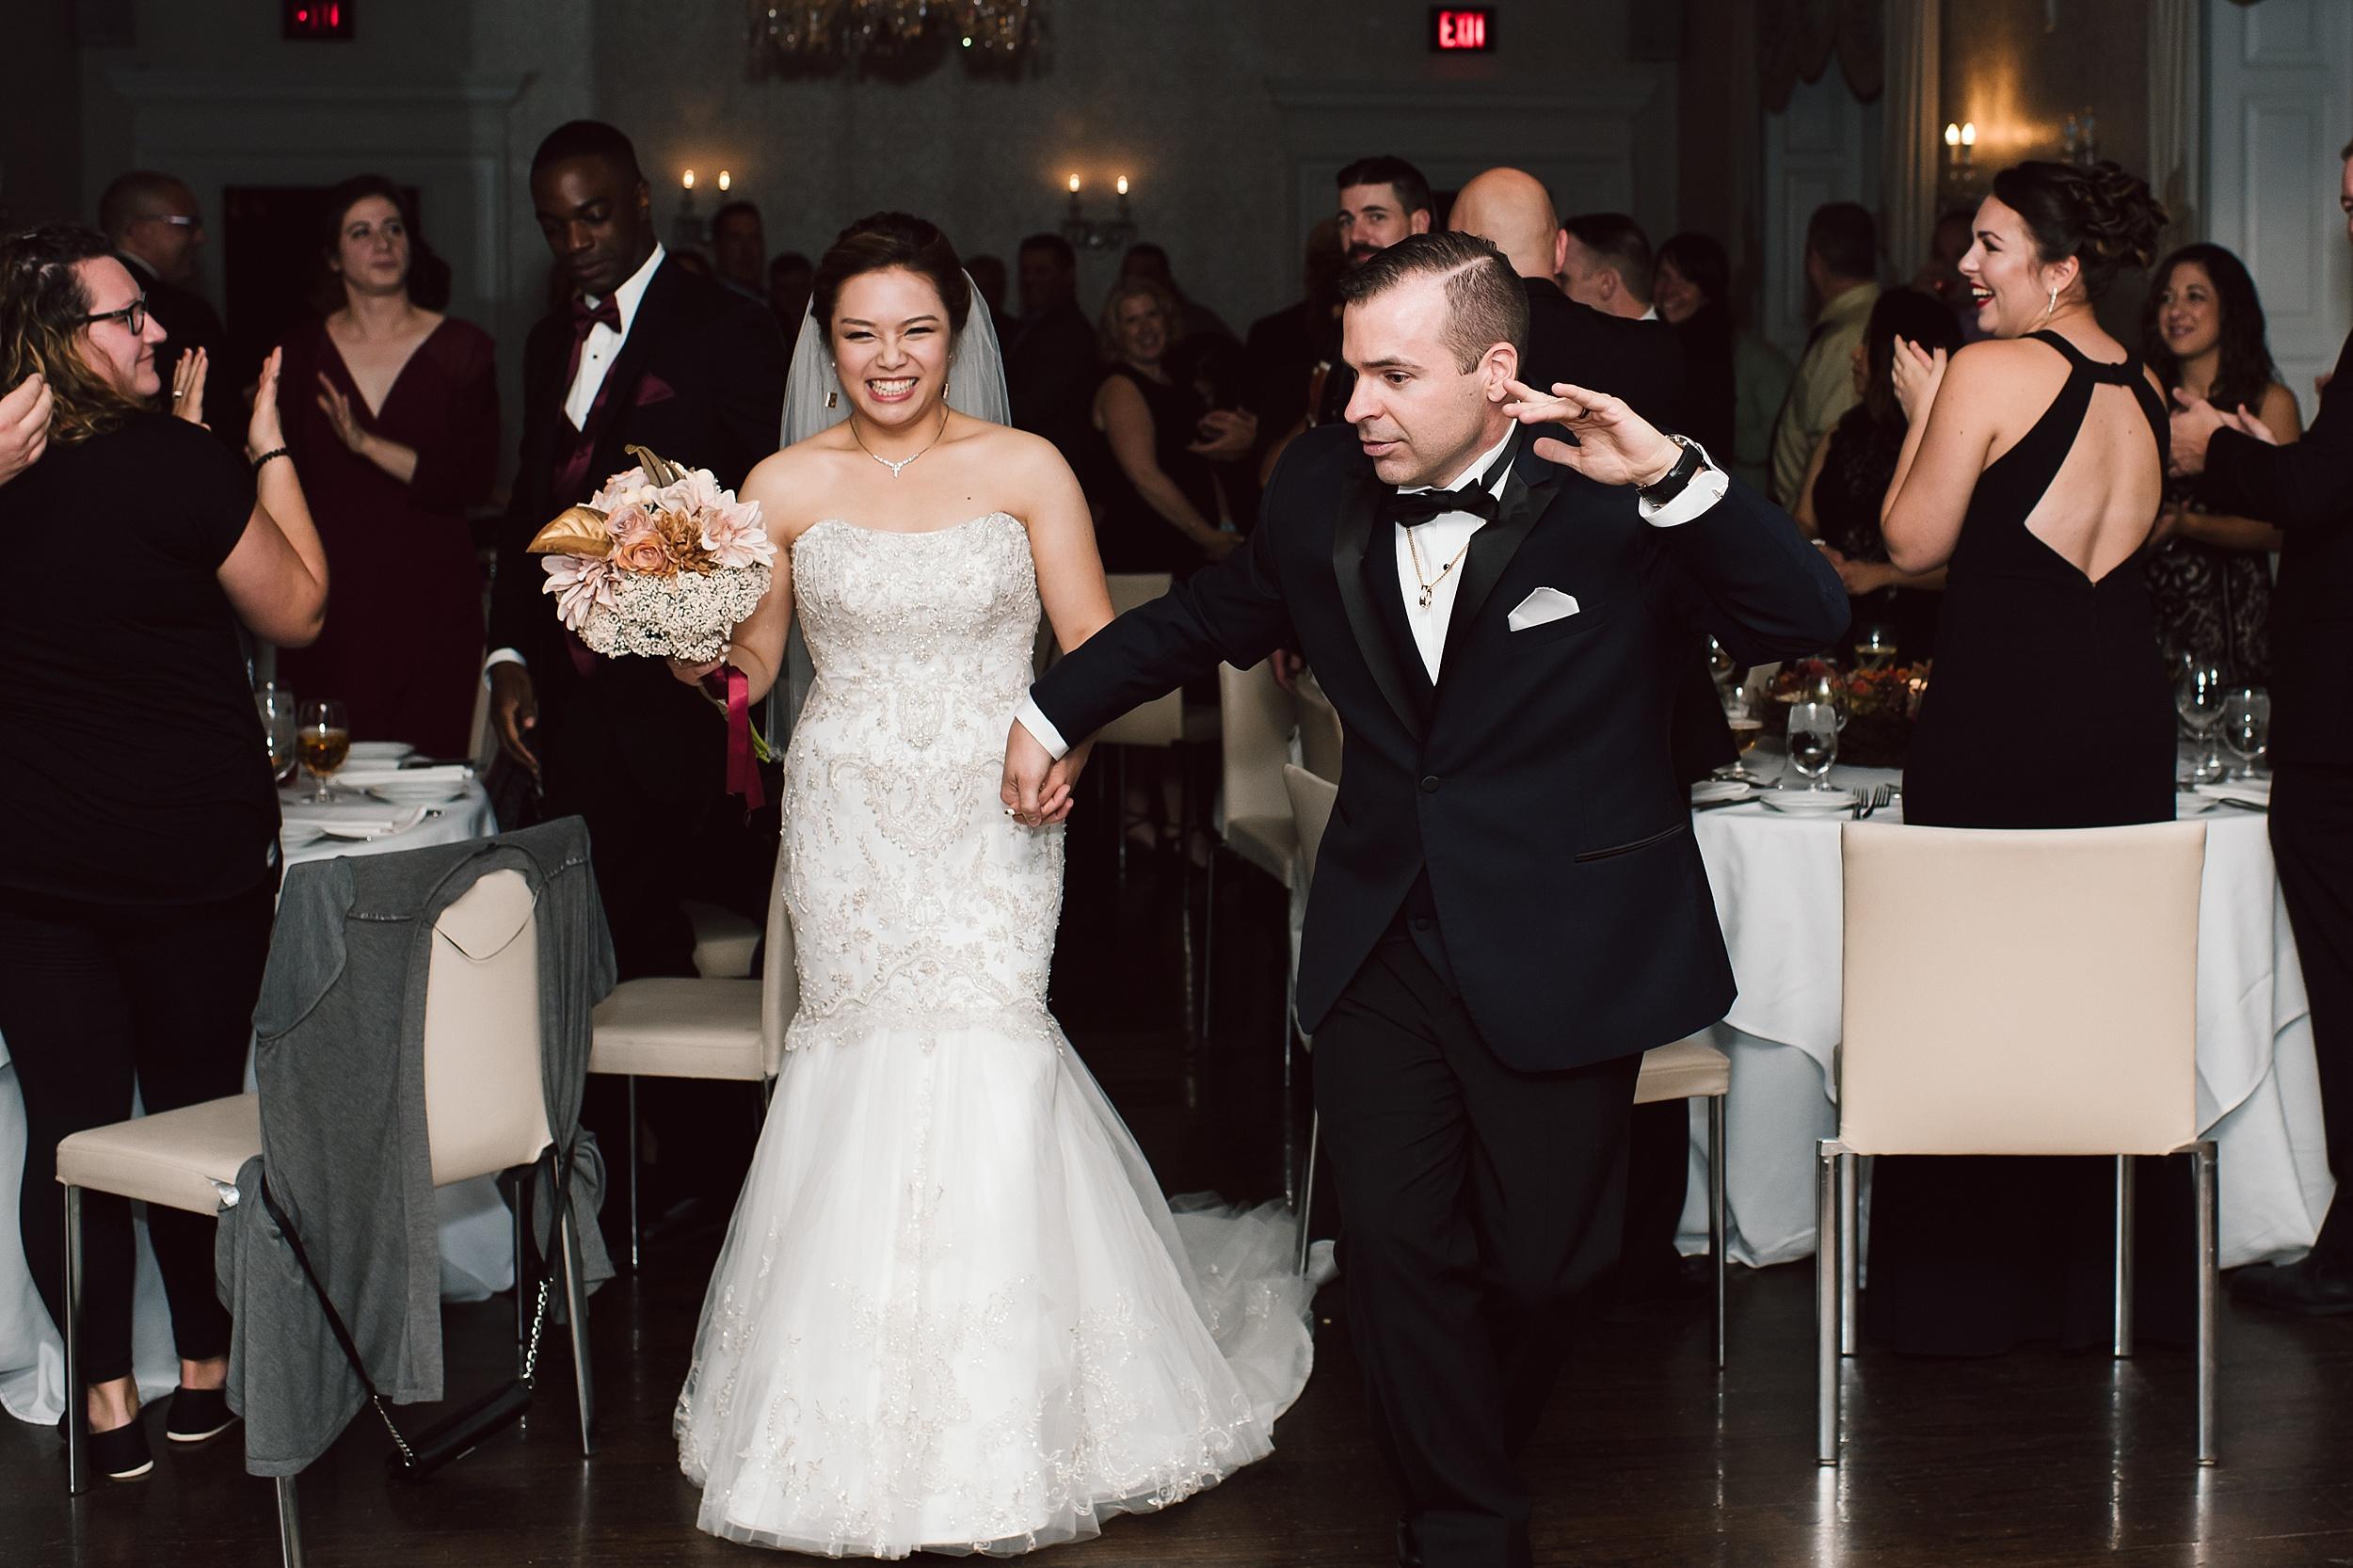 Sunnybrook_Estates_Alexander_Muir_Toronto_Wedding_Photographer_0070.jpg